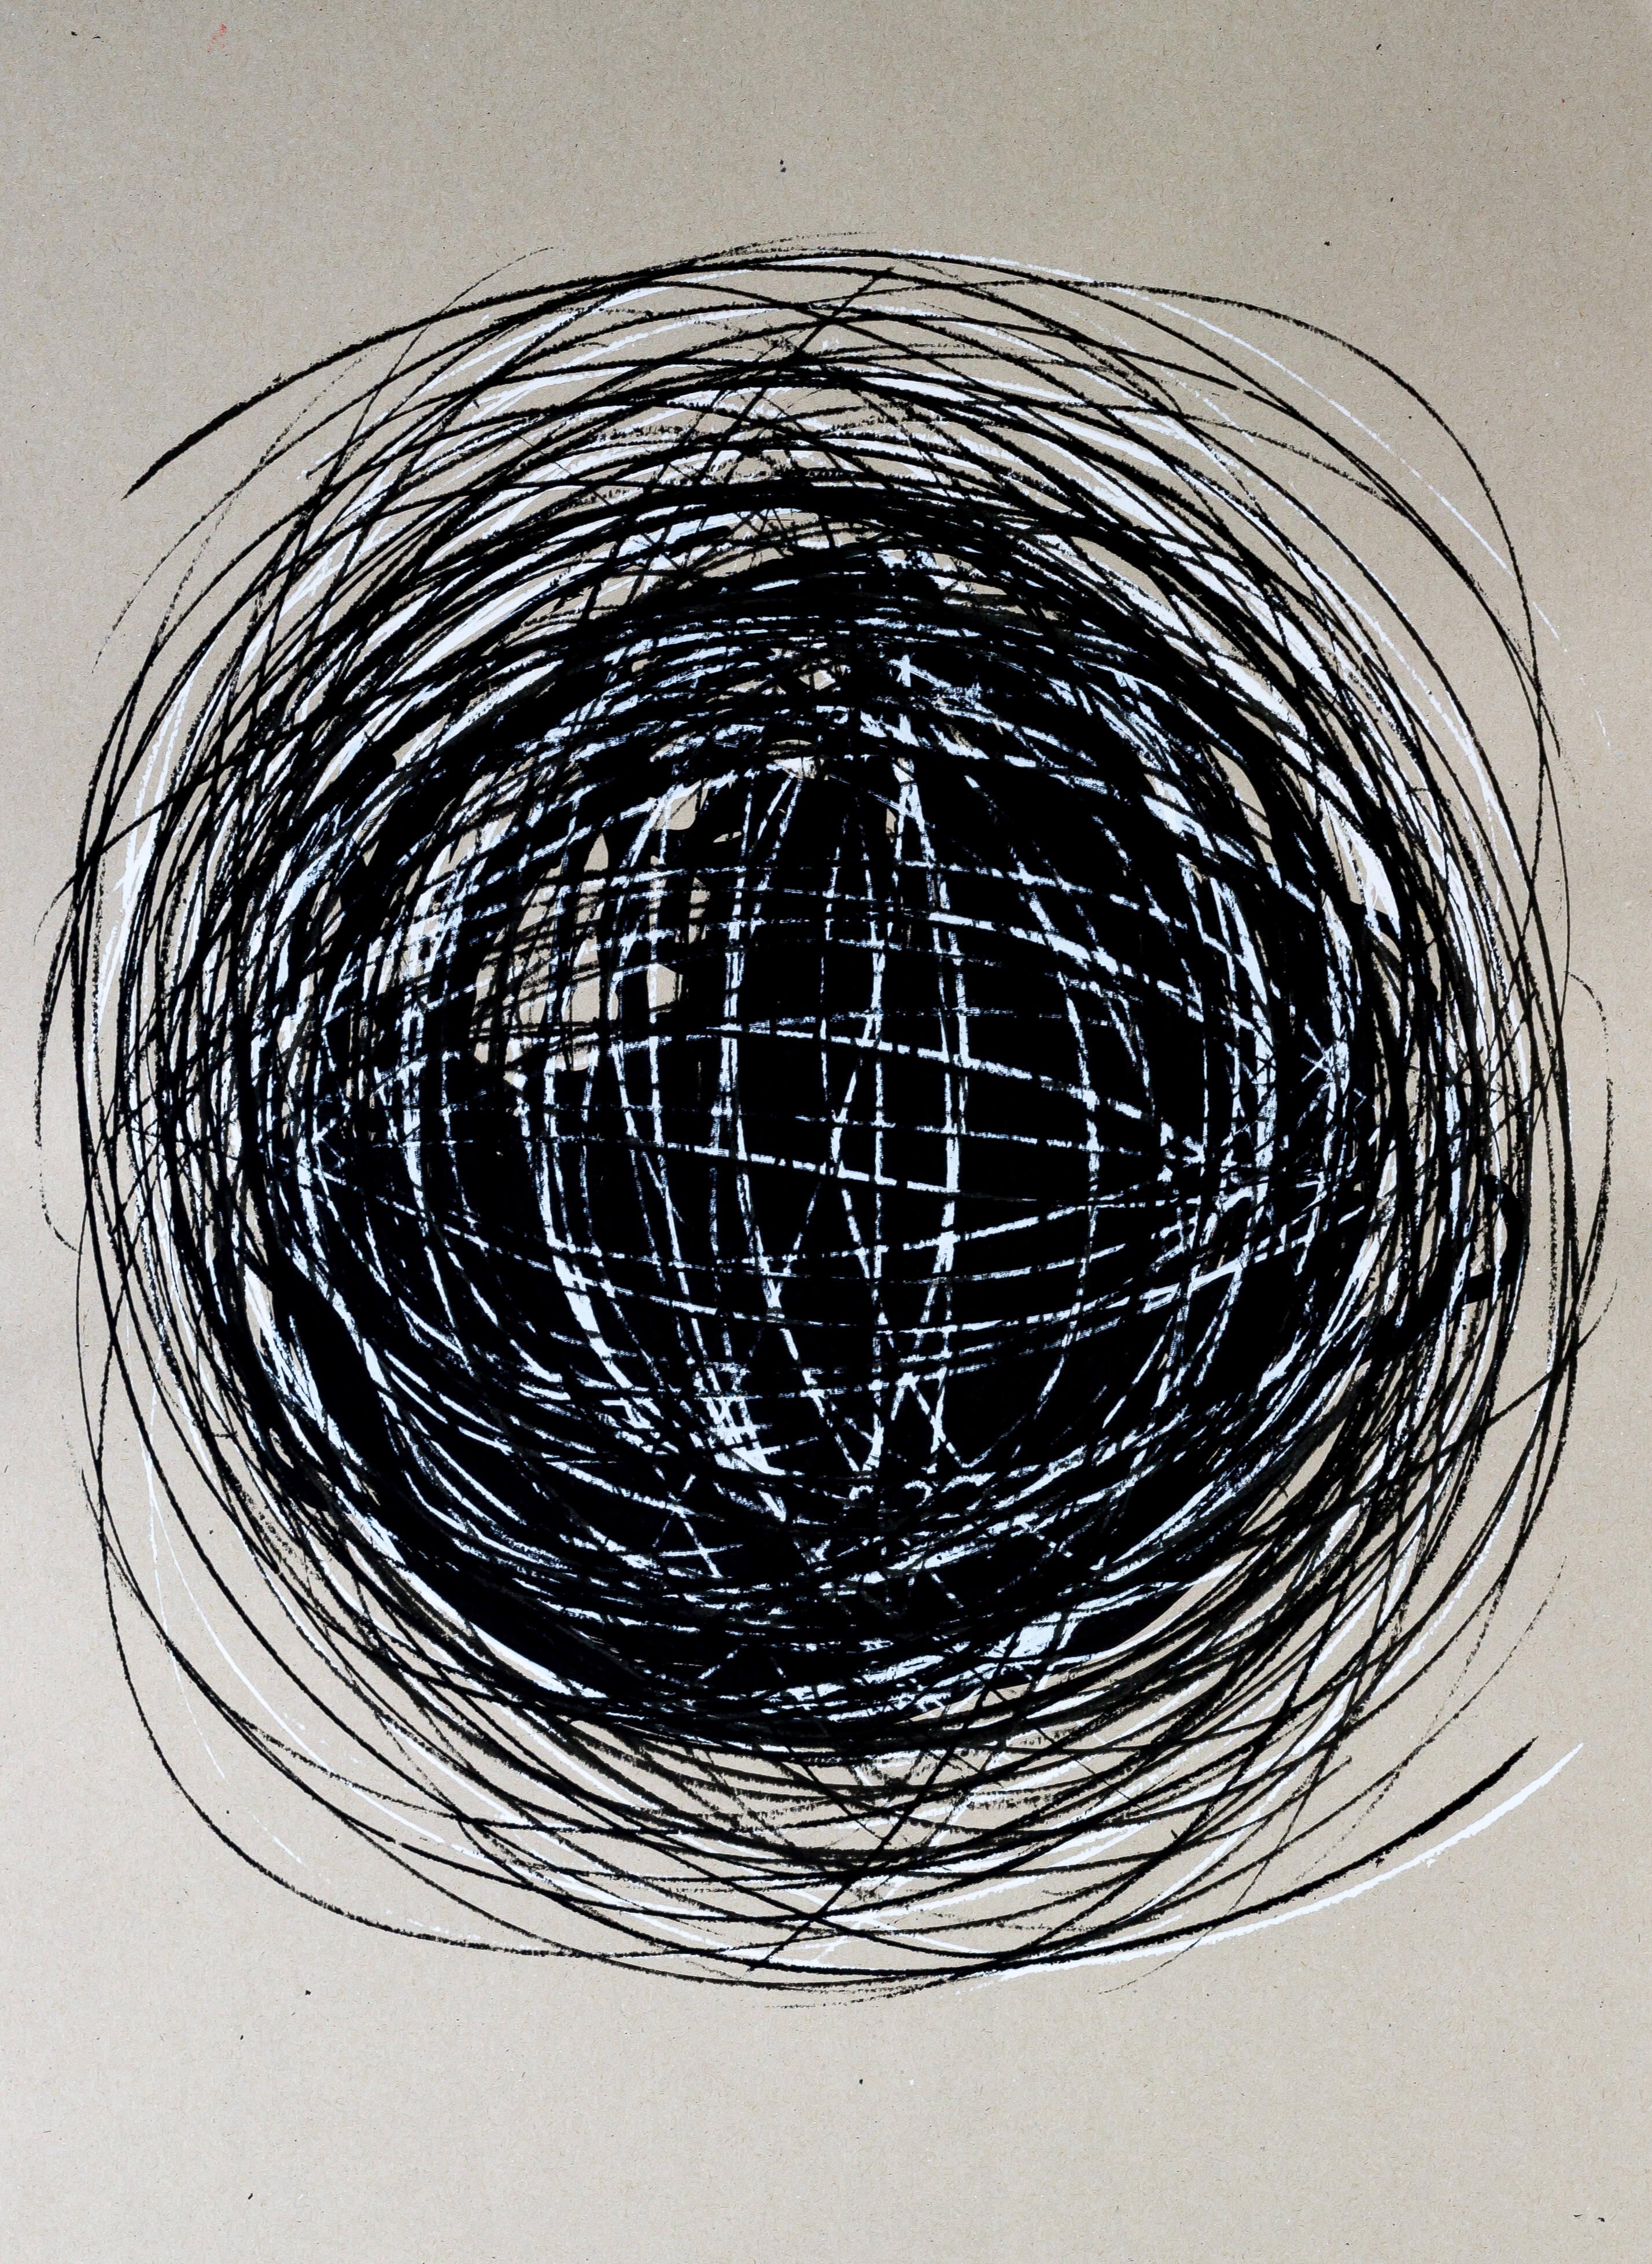 Katharina Albers, Transformation XXVII, 2011, Siebdruck, Unikat, 59,5x42cm